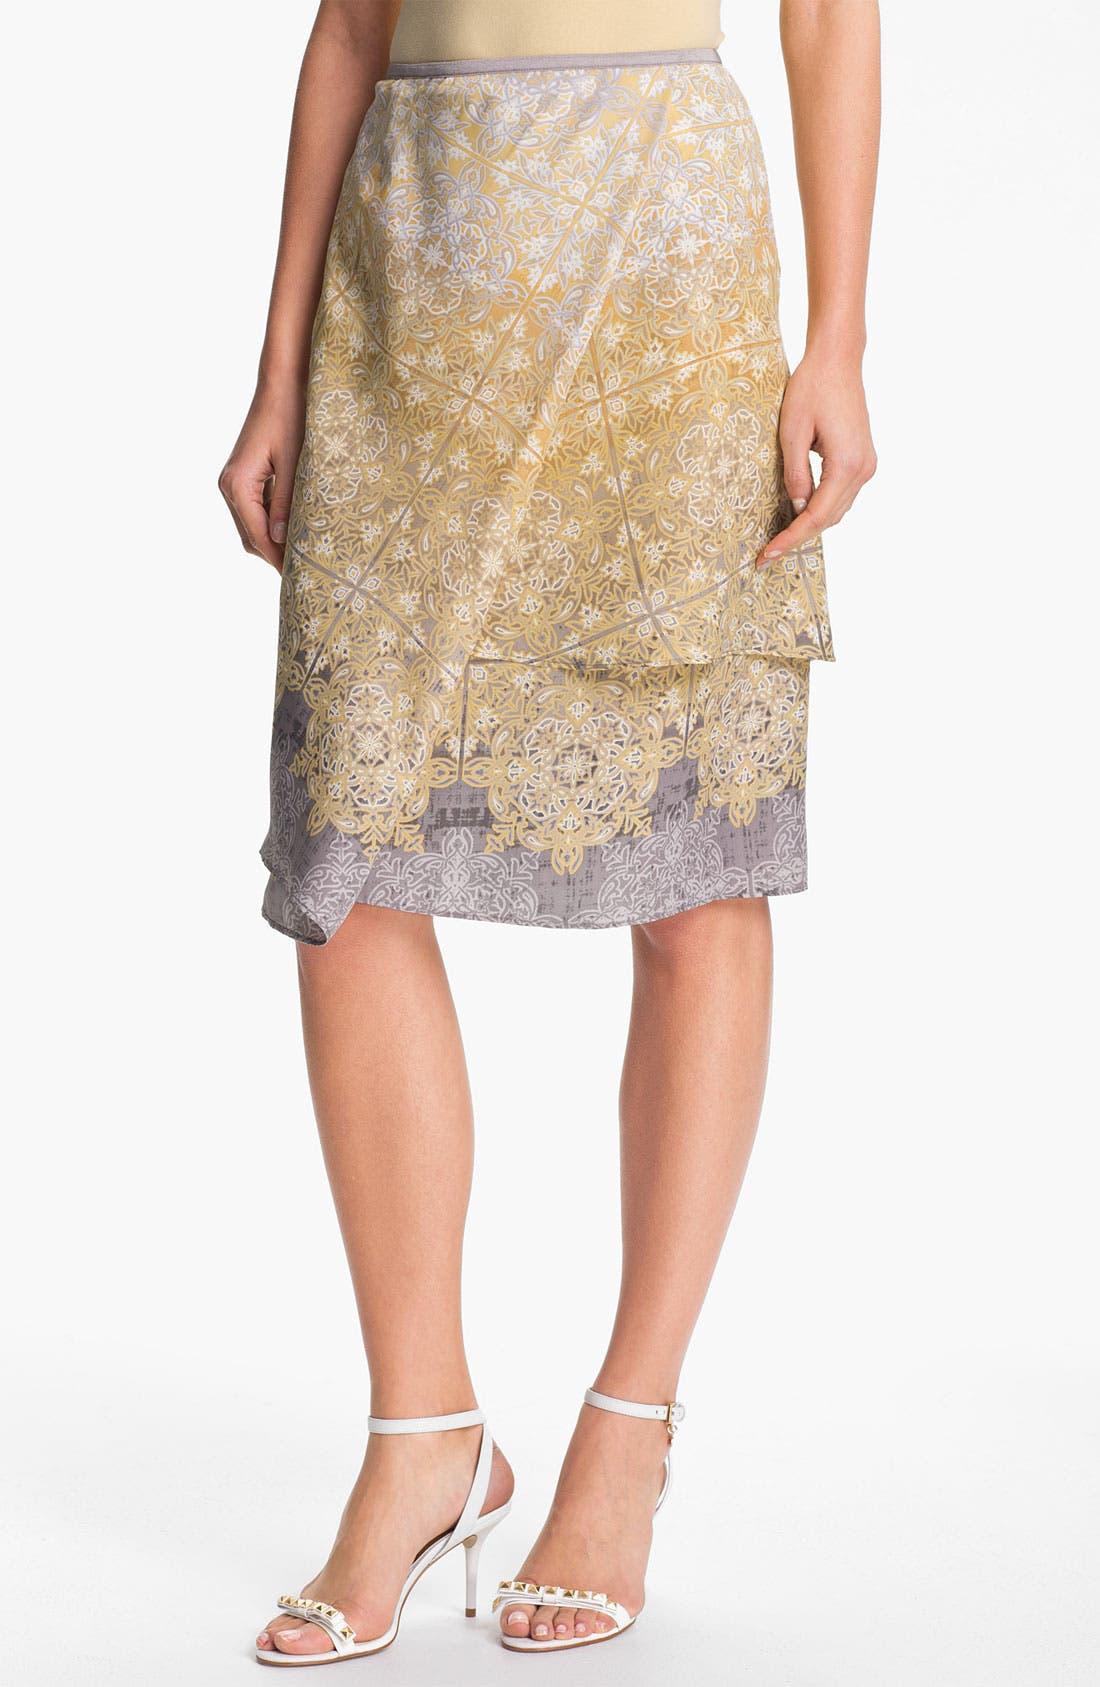 Alternate Image 1 Selected - Nic + Zoe 'Filigree' Print Skirt